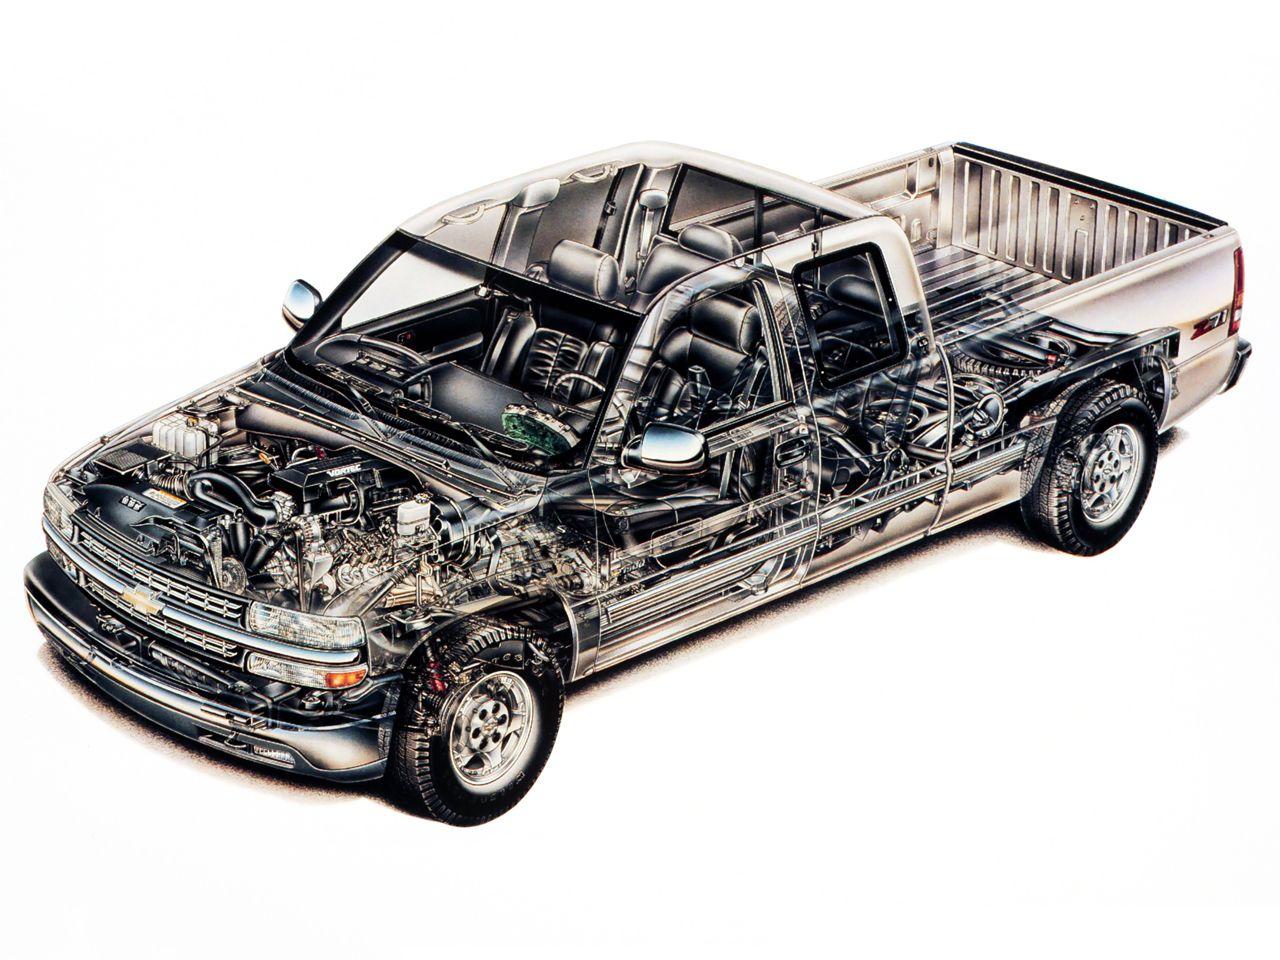 19992002 Chevrolet Silverado Z71 Extended Cab fron three